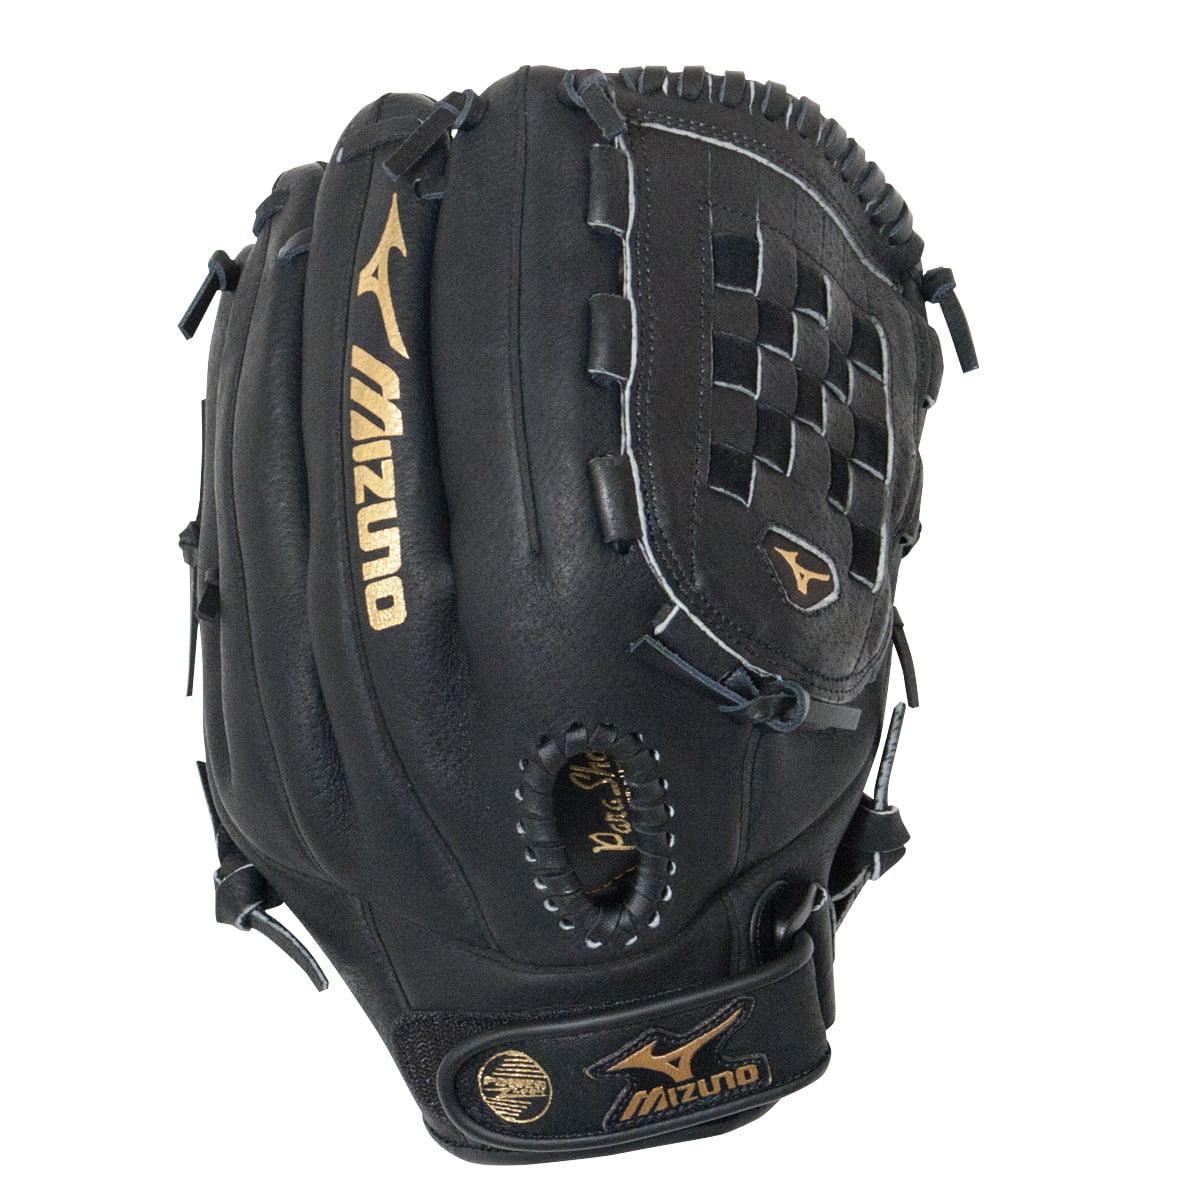 "Mizuno 12"" Right-Handed Baseball Glove"